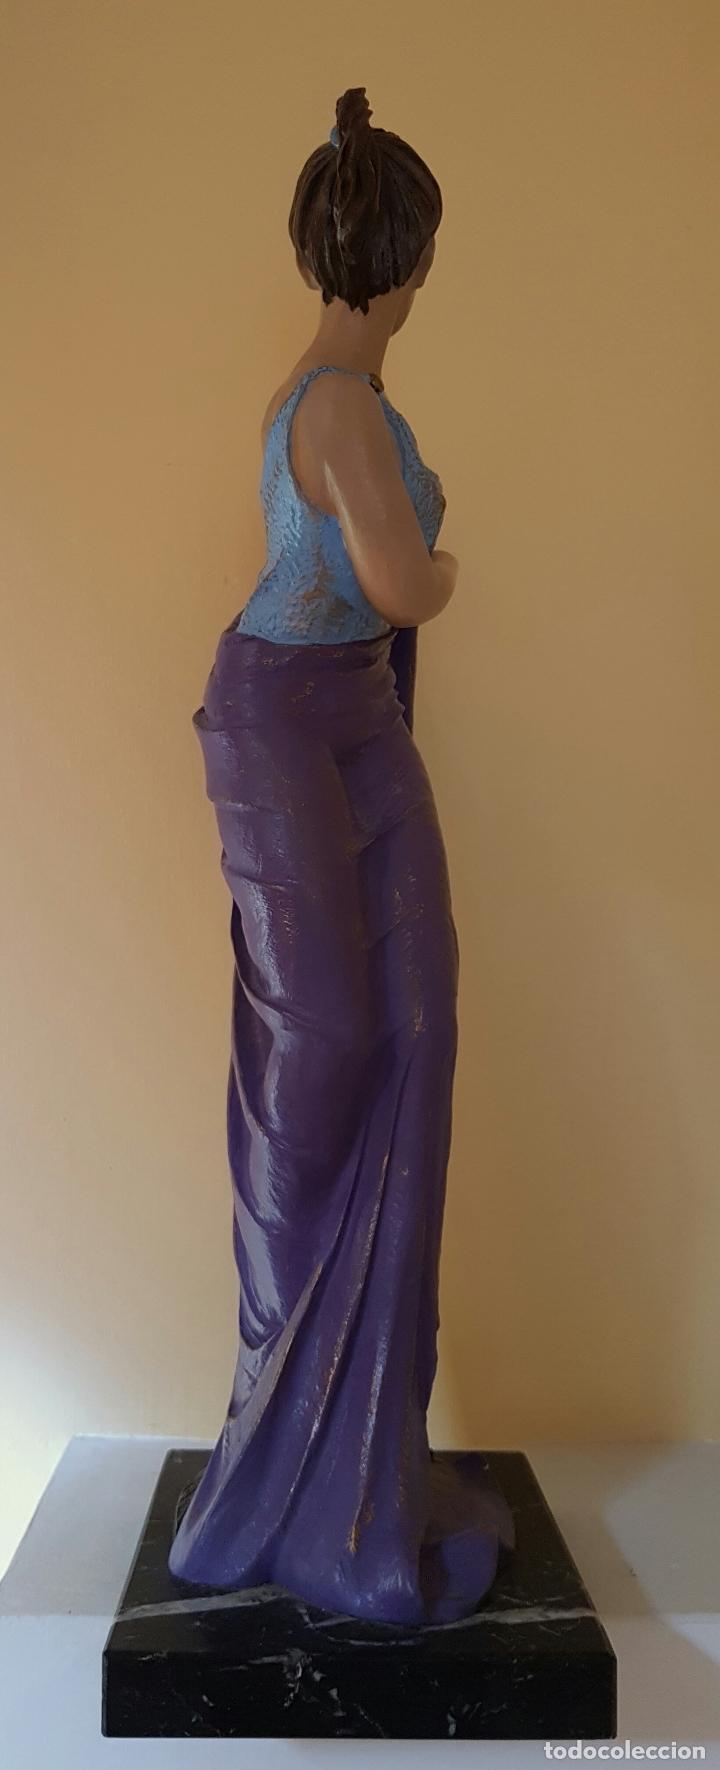 Arte: Gran escultura de doncella estilo art nouveau bellamente policromada a mano, firmada, M.Senserrich . - Foto 4 - 64781307